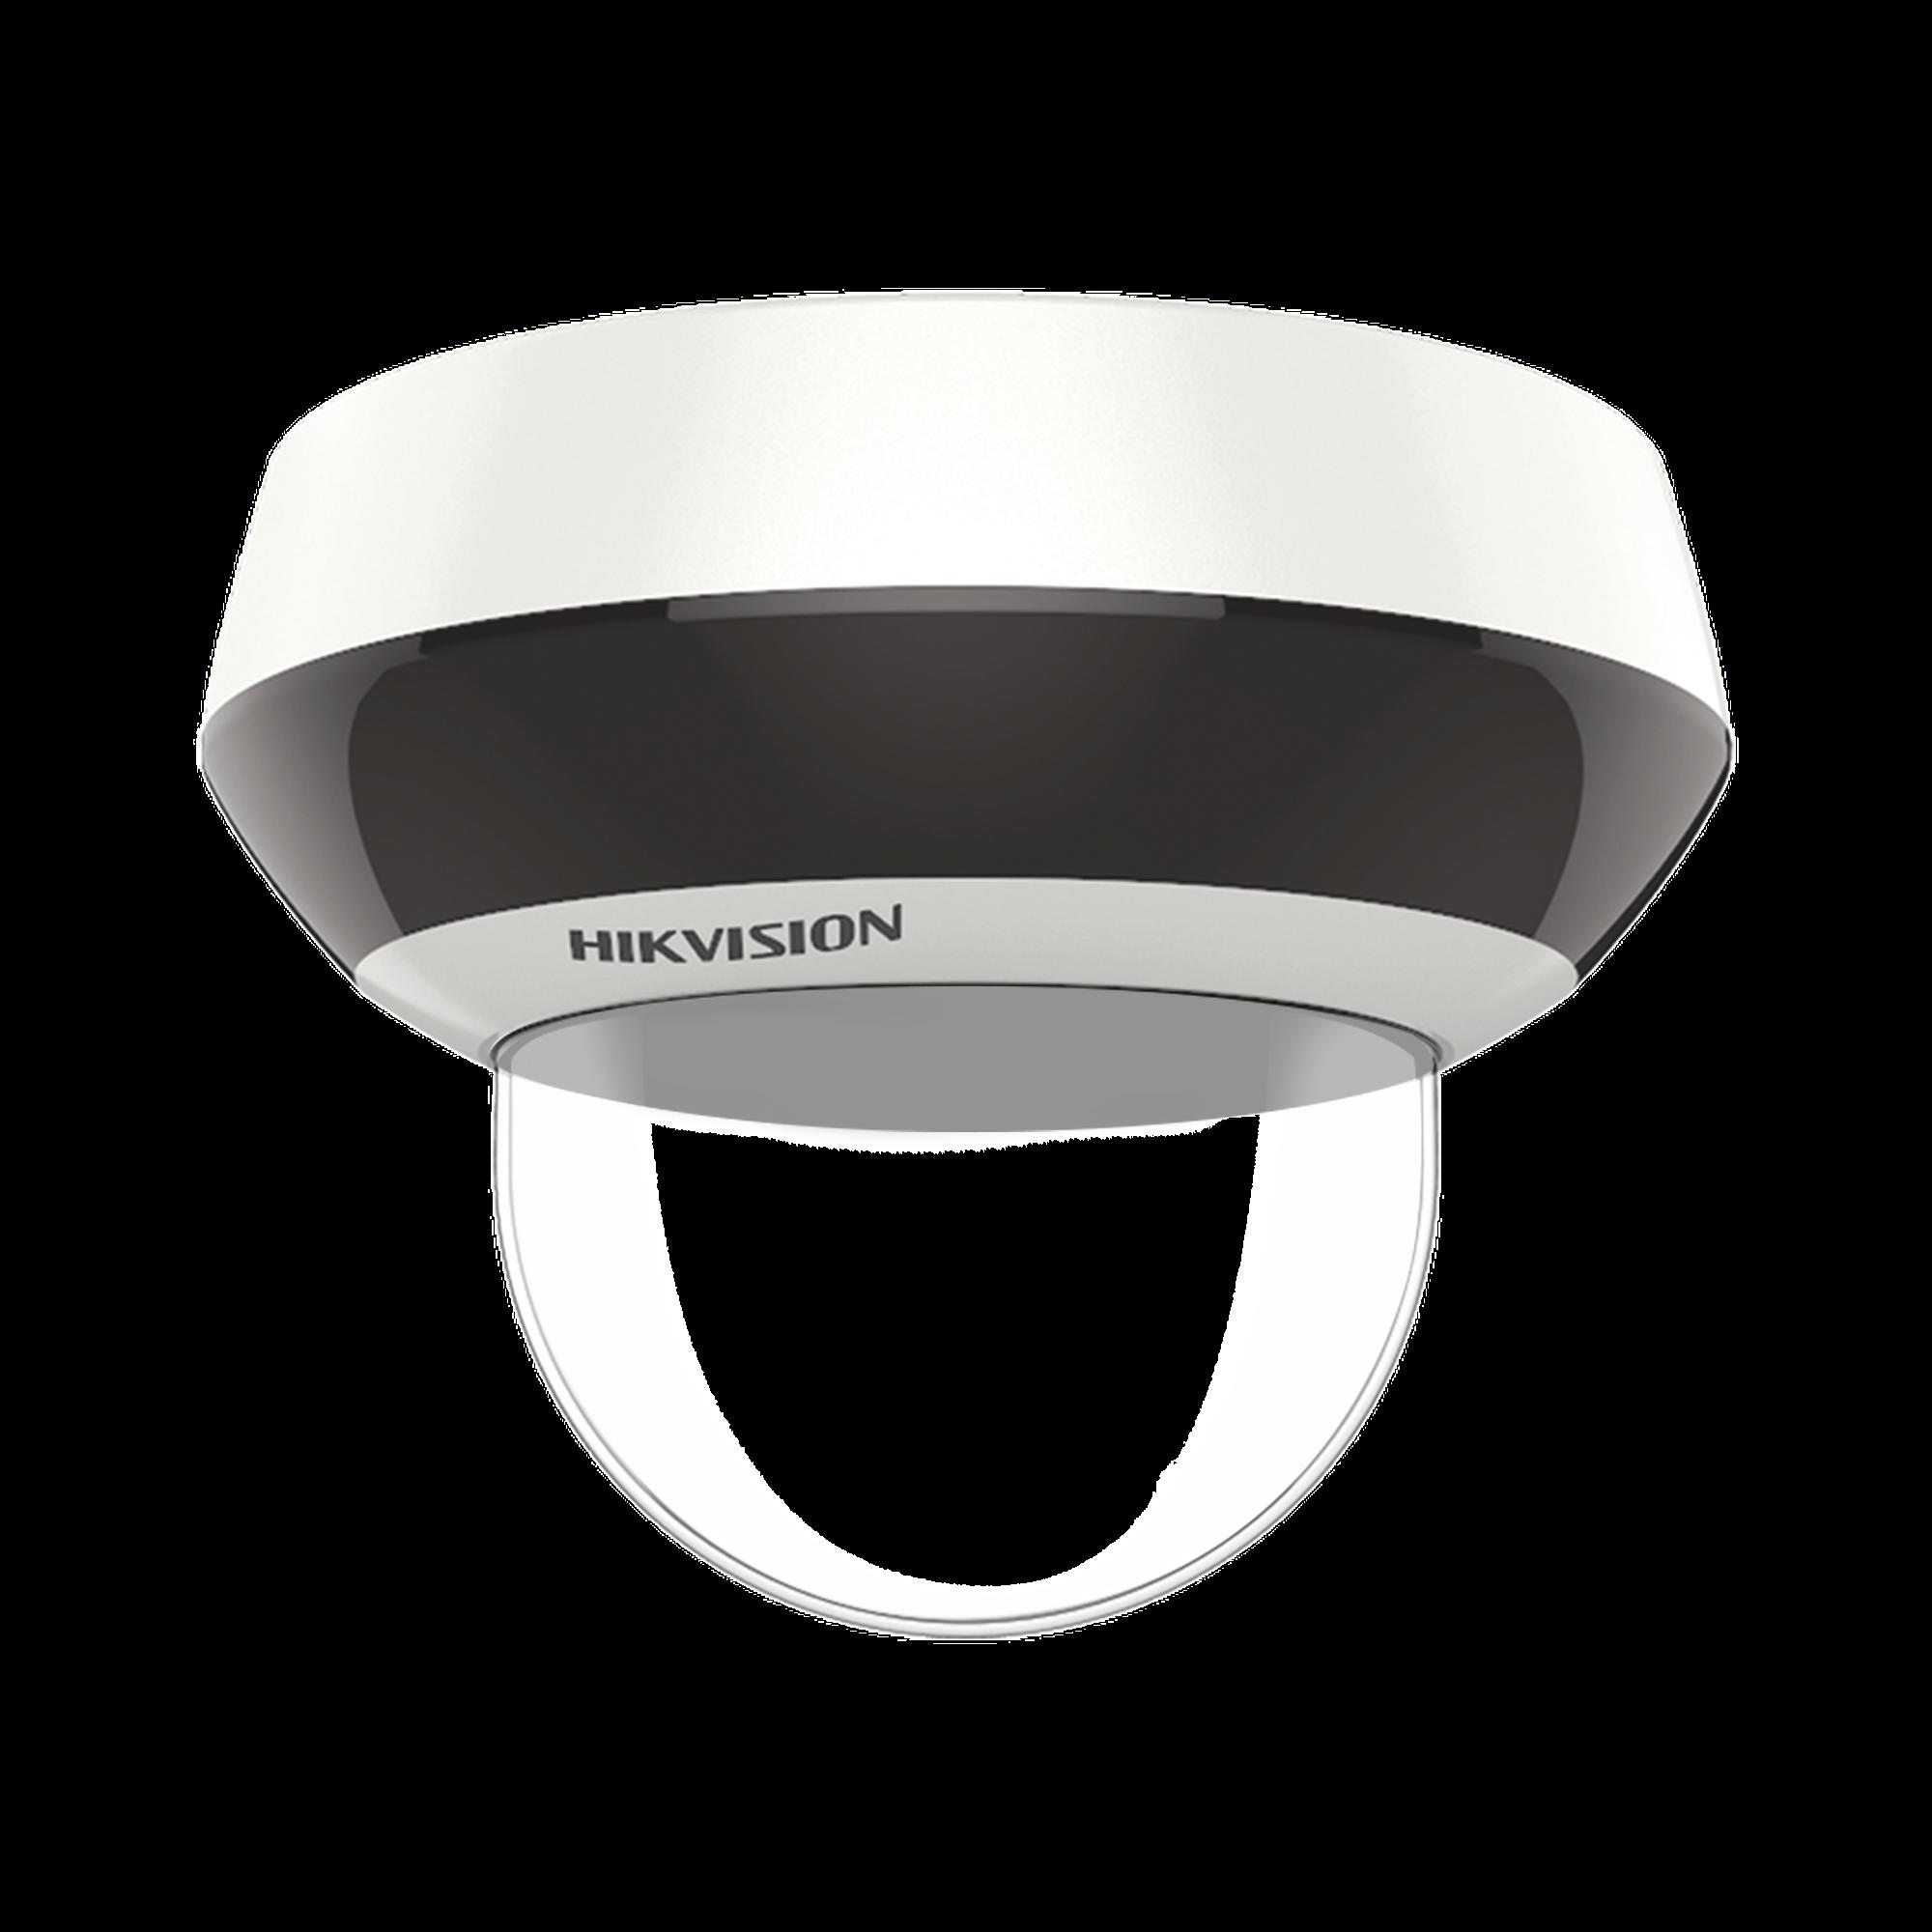 Burbuja Transparente para Mini PTZ / HIKVISION / HiLook / IP66 / IK10